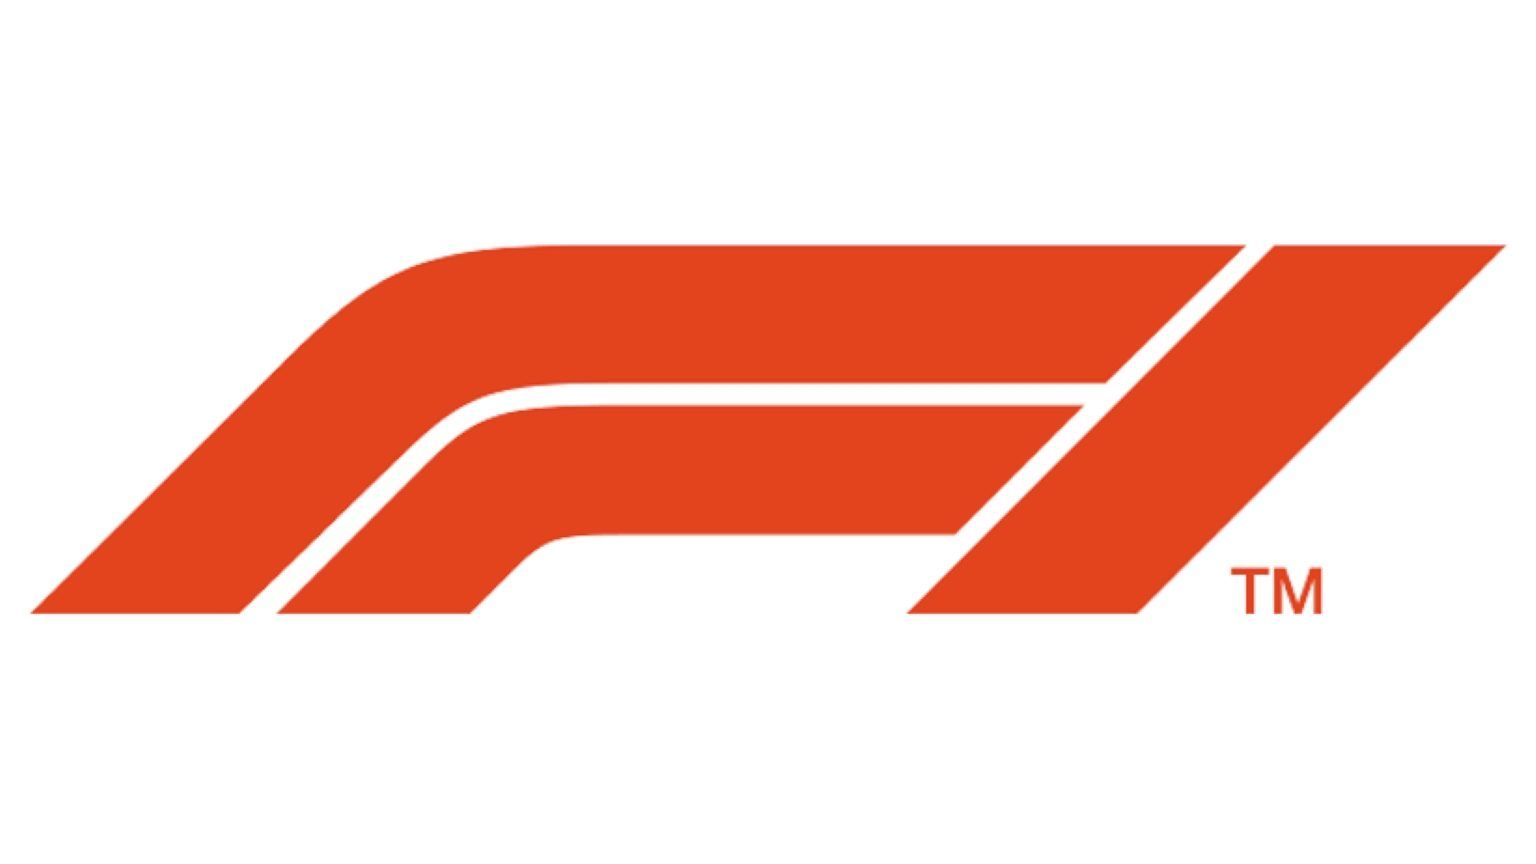 F1TV logo